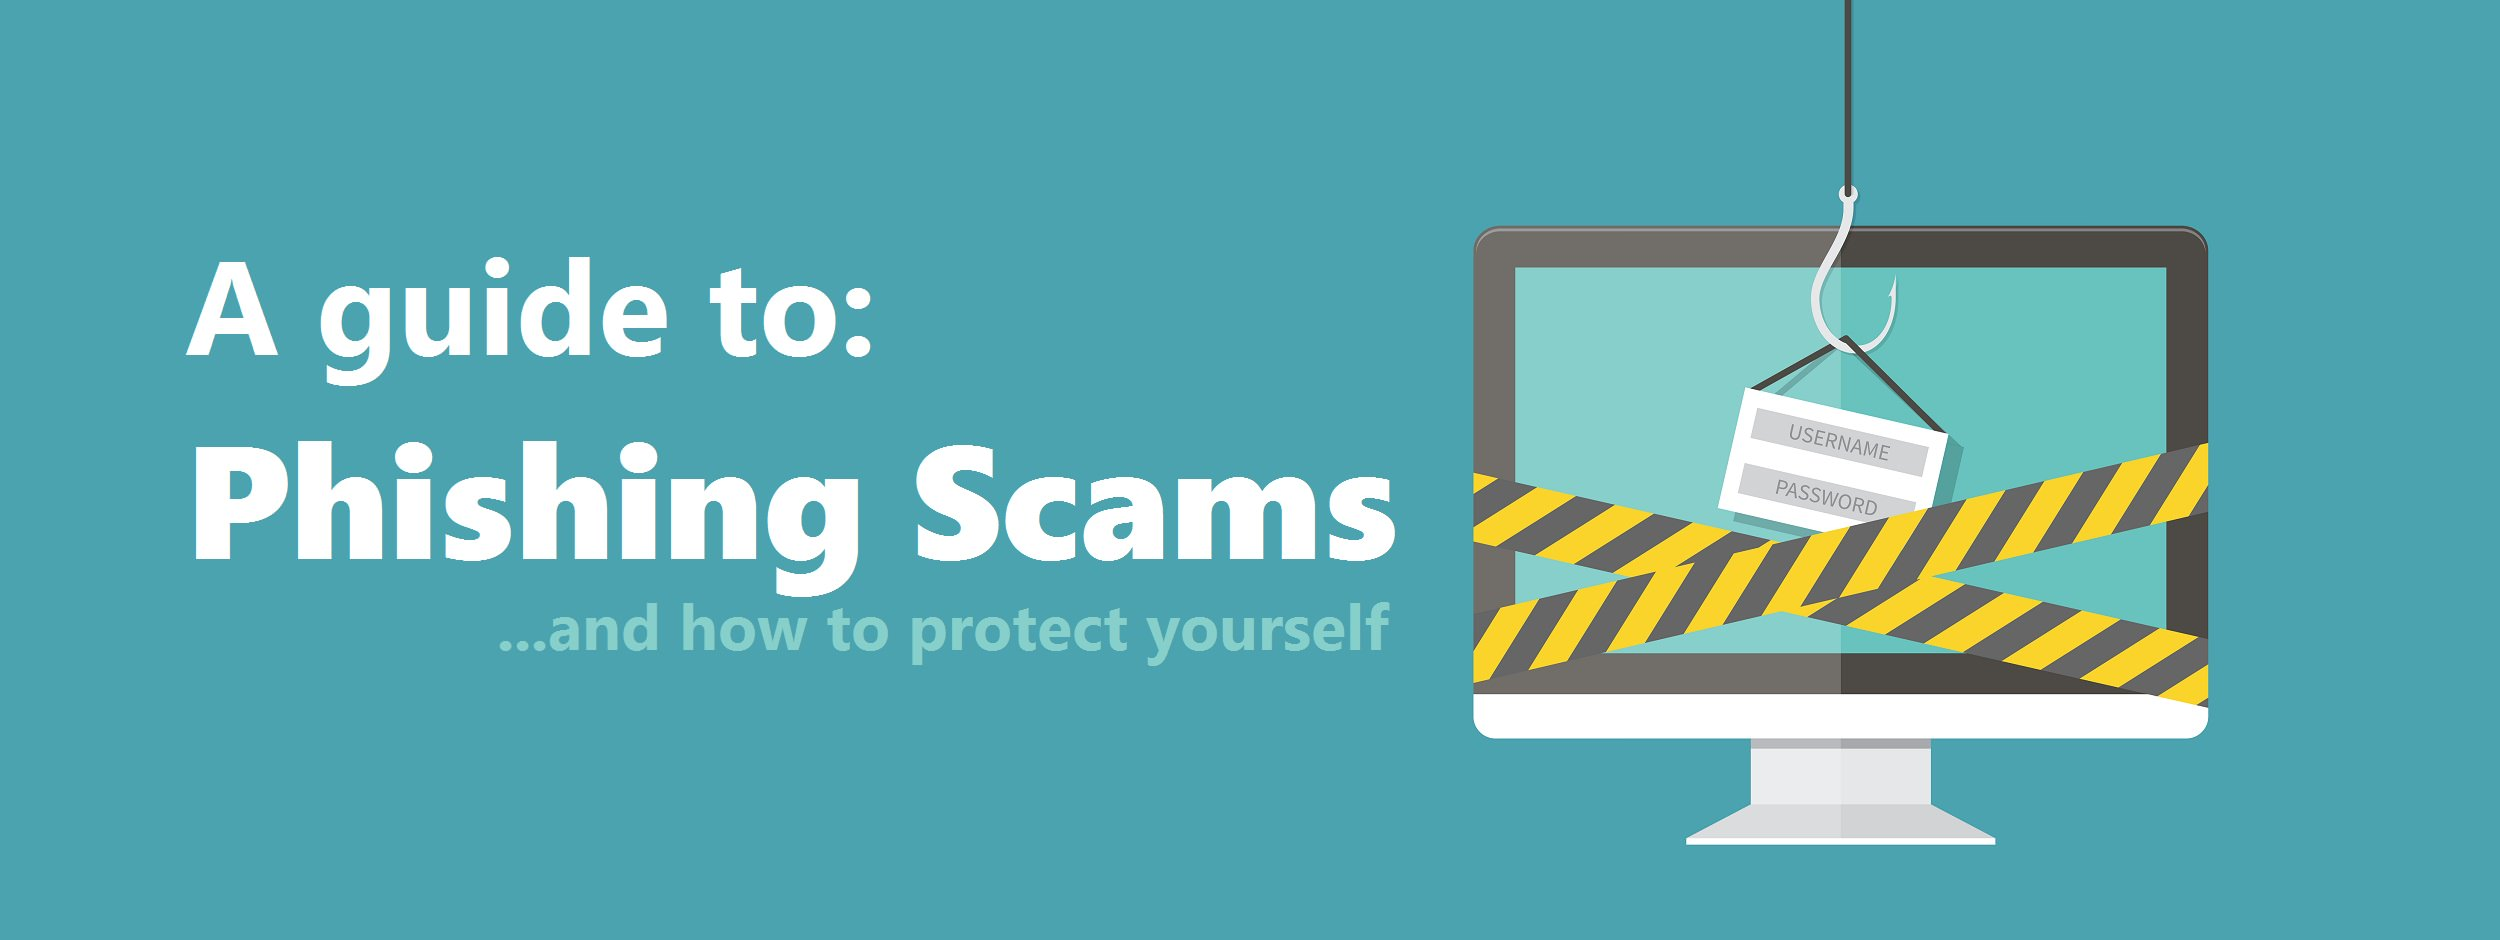 phishing-scam-title